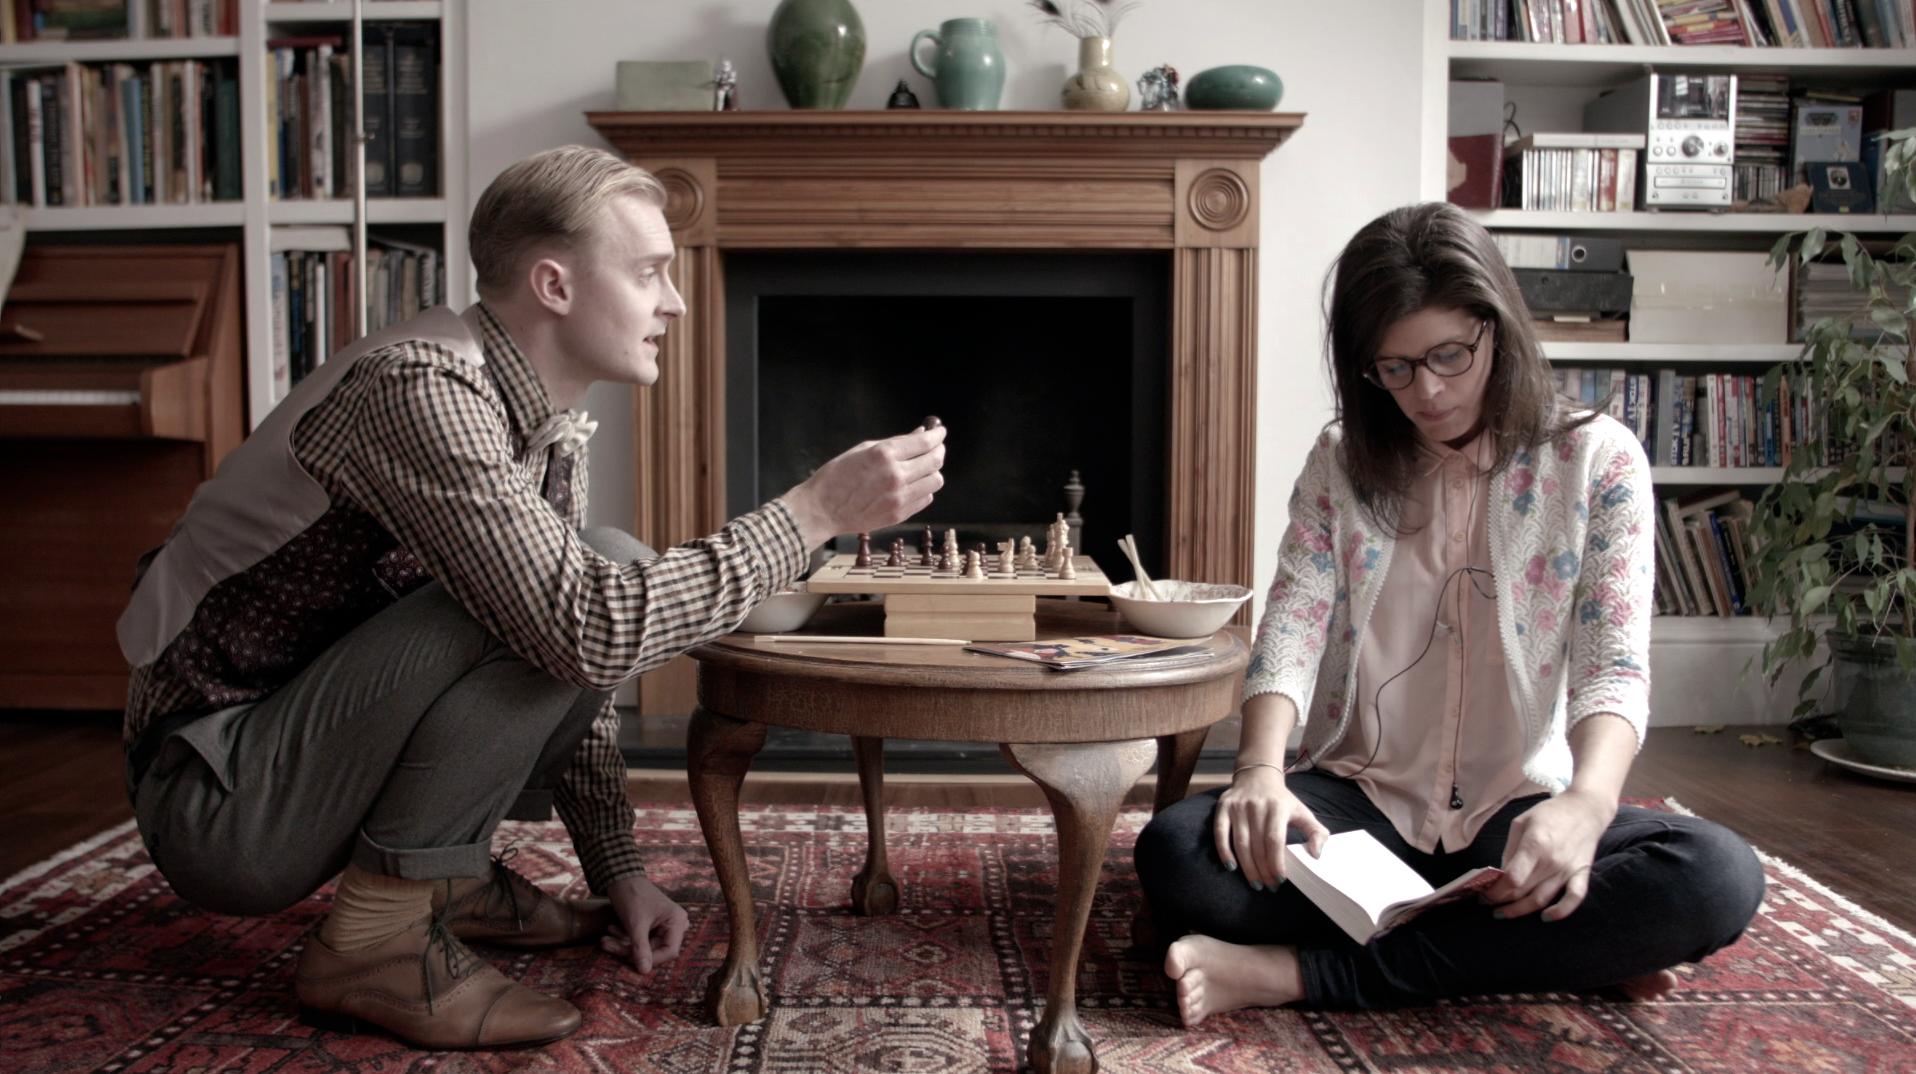 'Rice & Ryzi' Short Film. Dir:  Jeroen Bogaert . Best Costume Design Award,  The 48 Hour Film Project, London , 2015